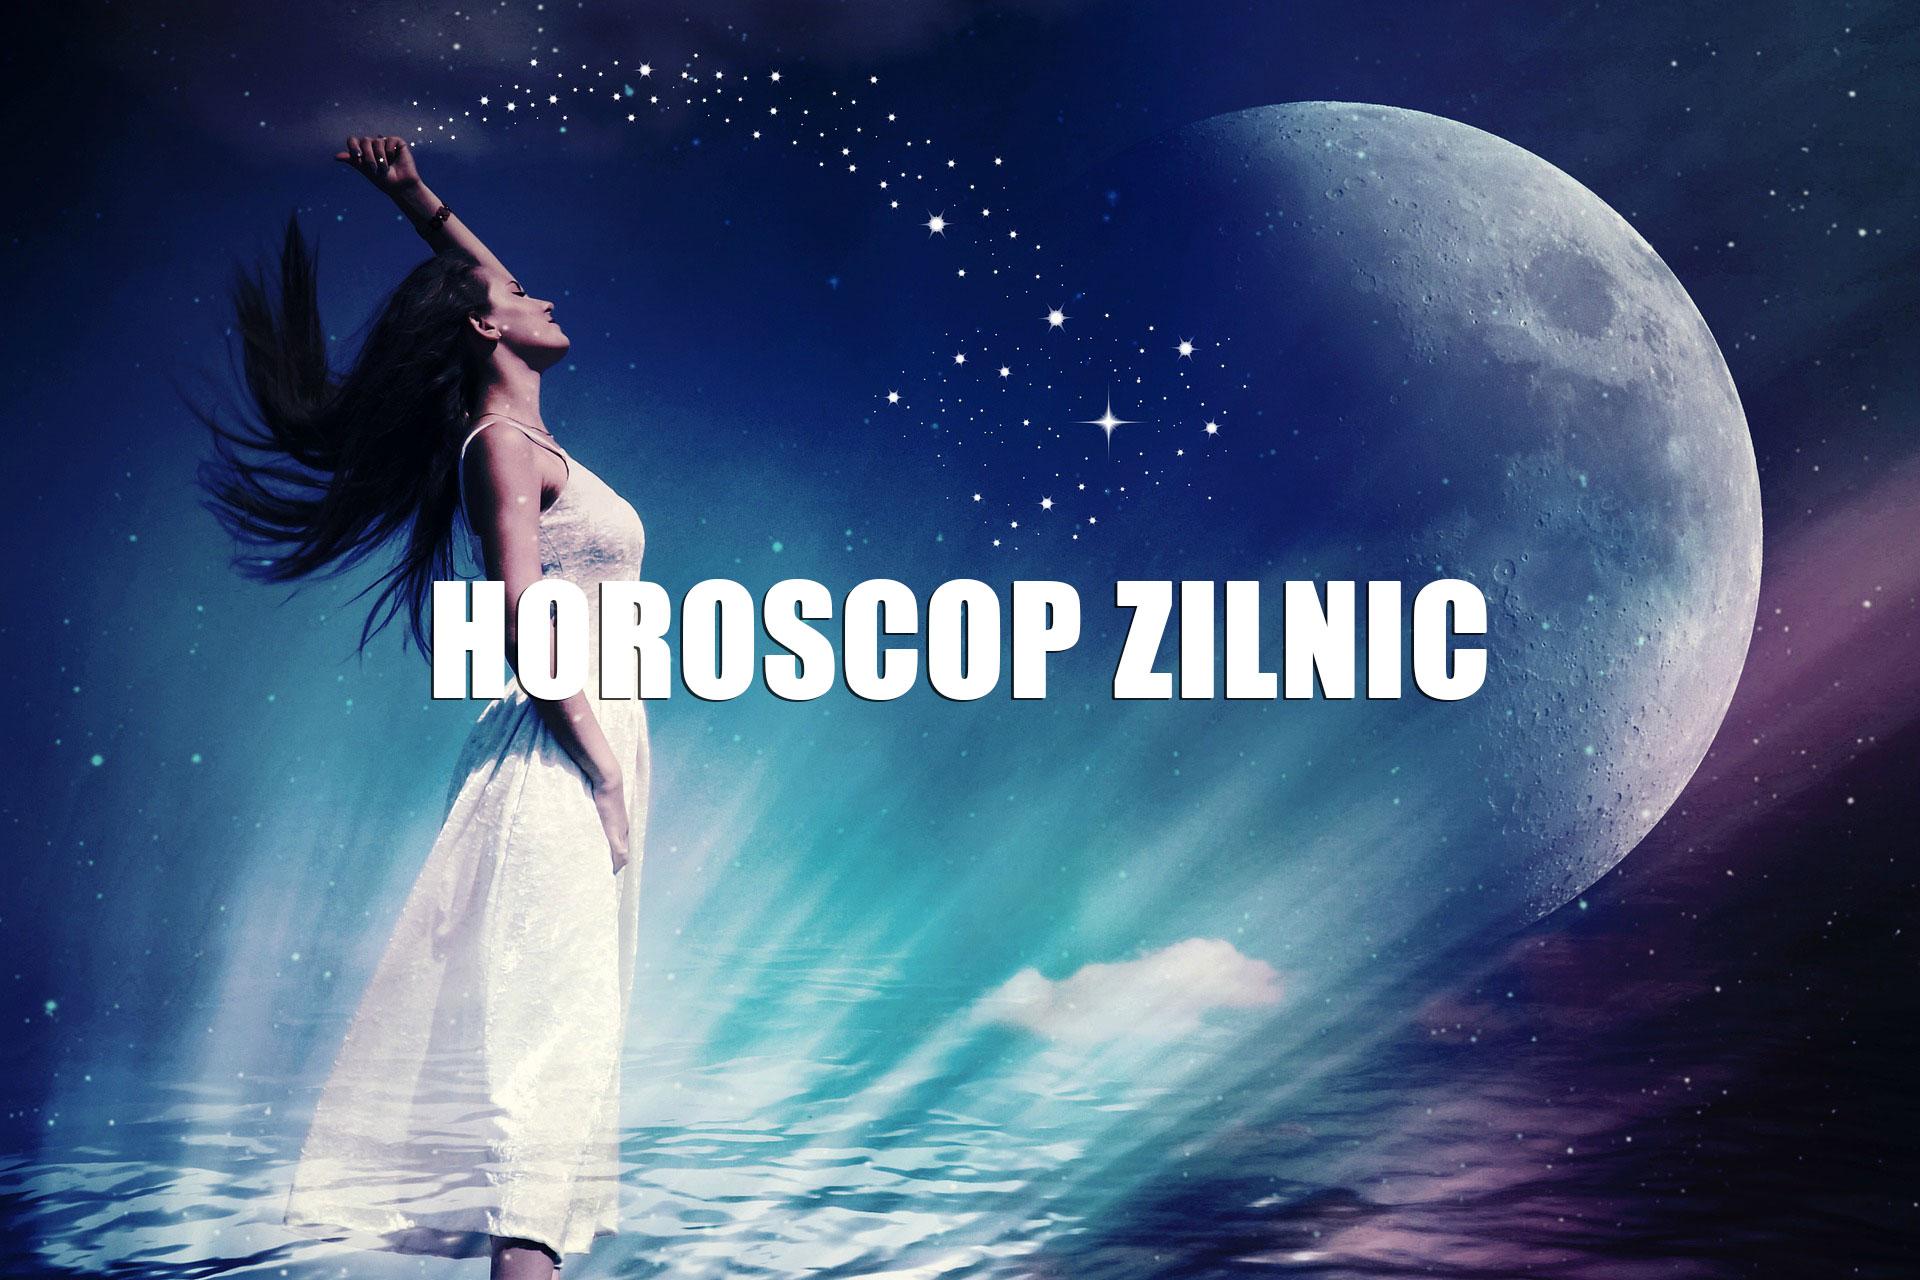 Horoscop zilnic 18 martie 2019 - 3 zodii încep săptămâna cu noroc